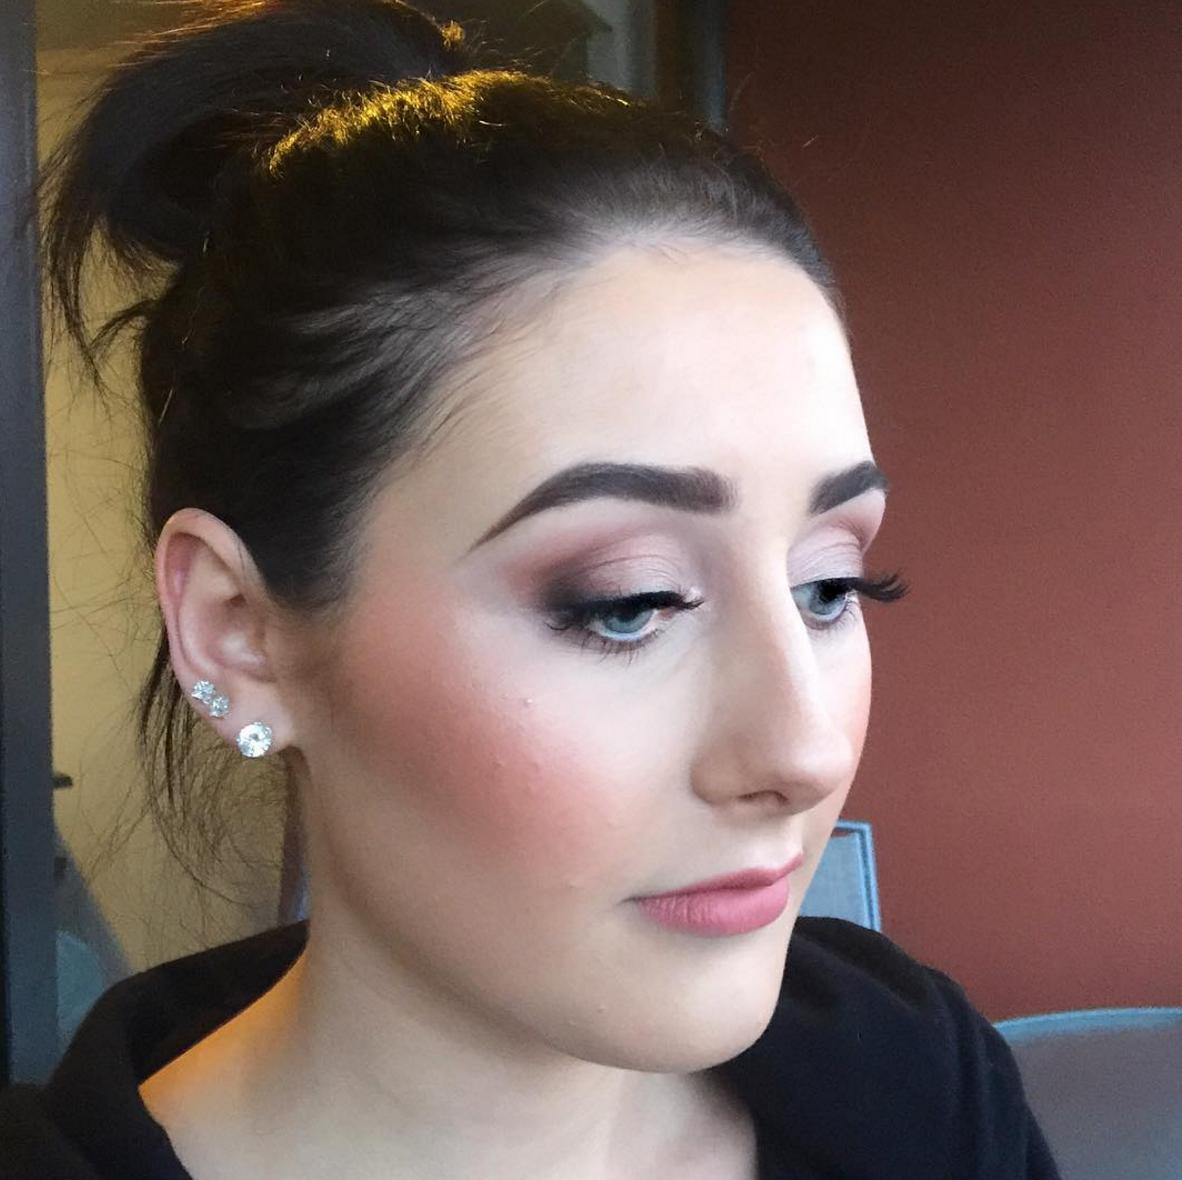 Image from  EVE Makeup Artistry Instagram